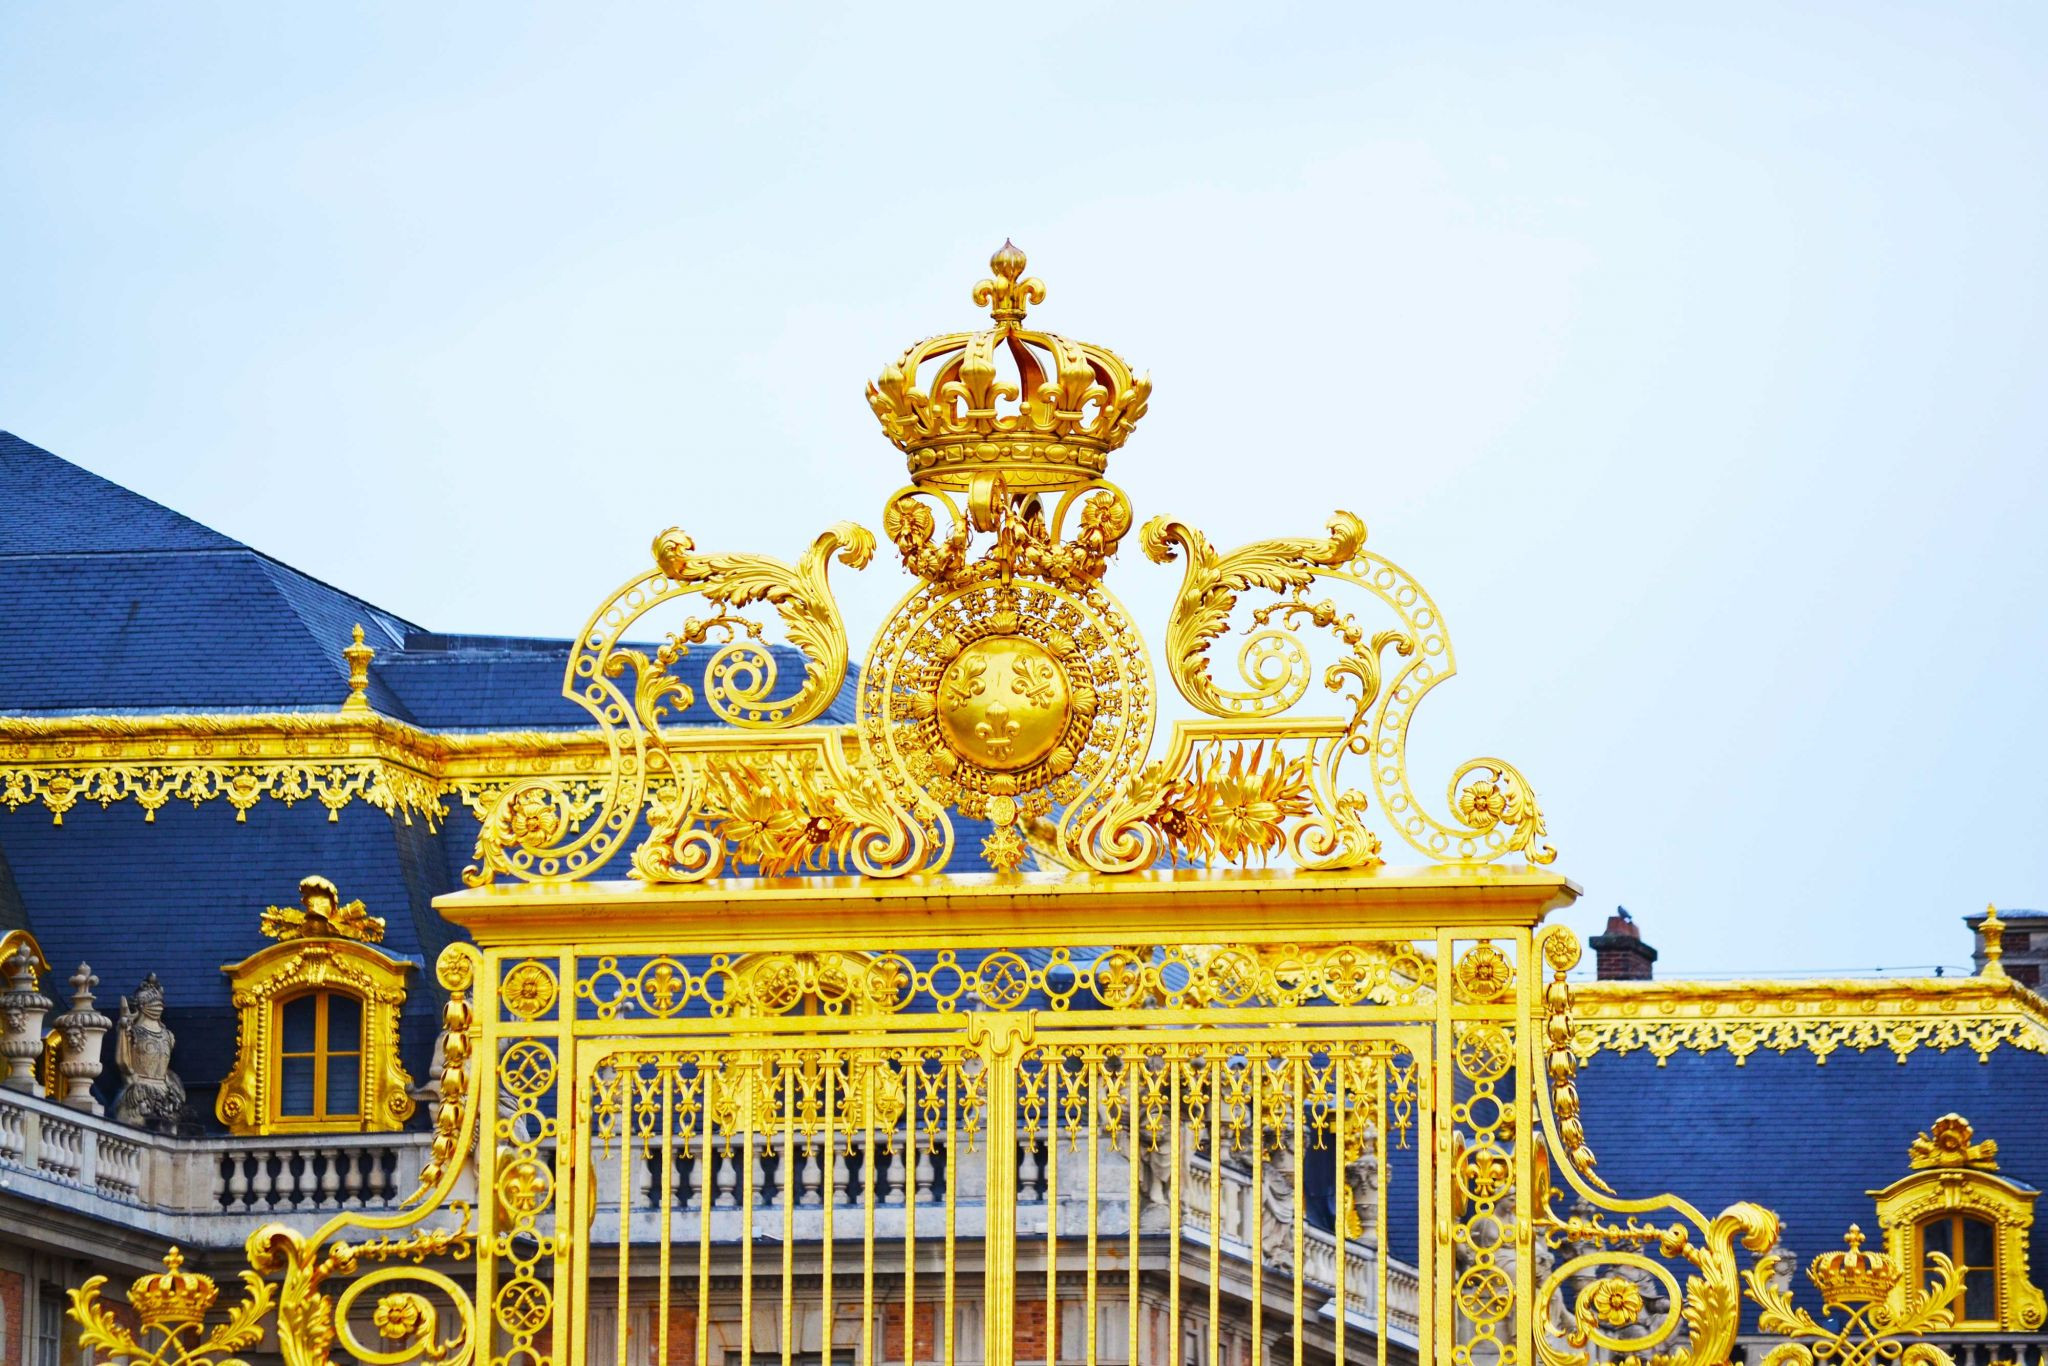 The Royal Gateway, Palace of Versailles, France